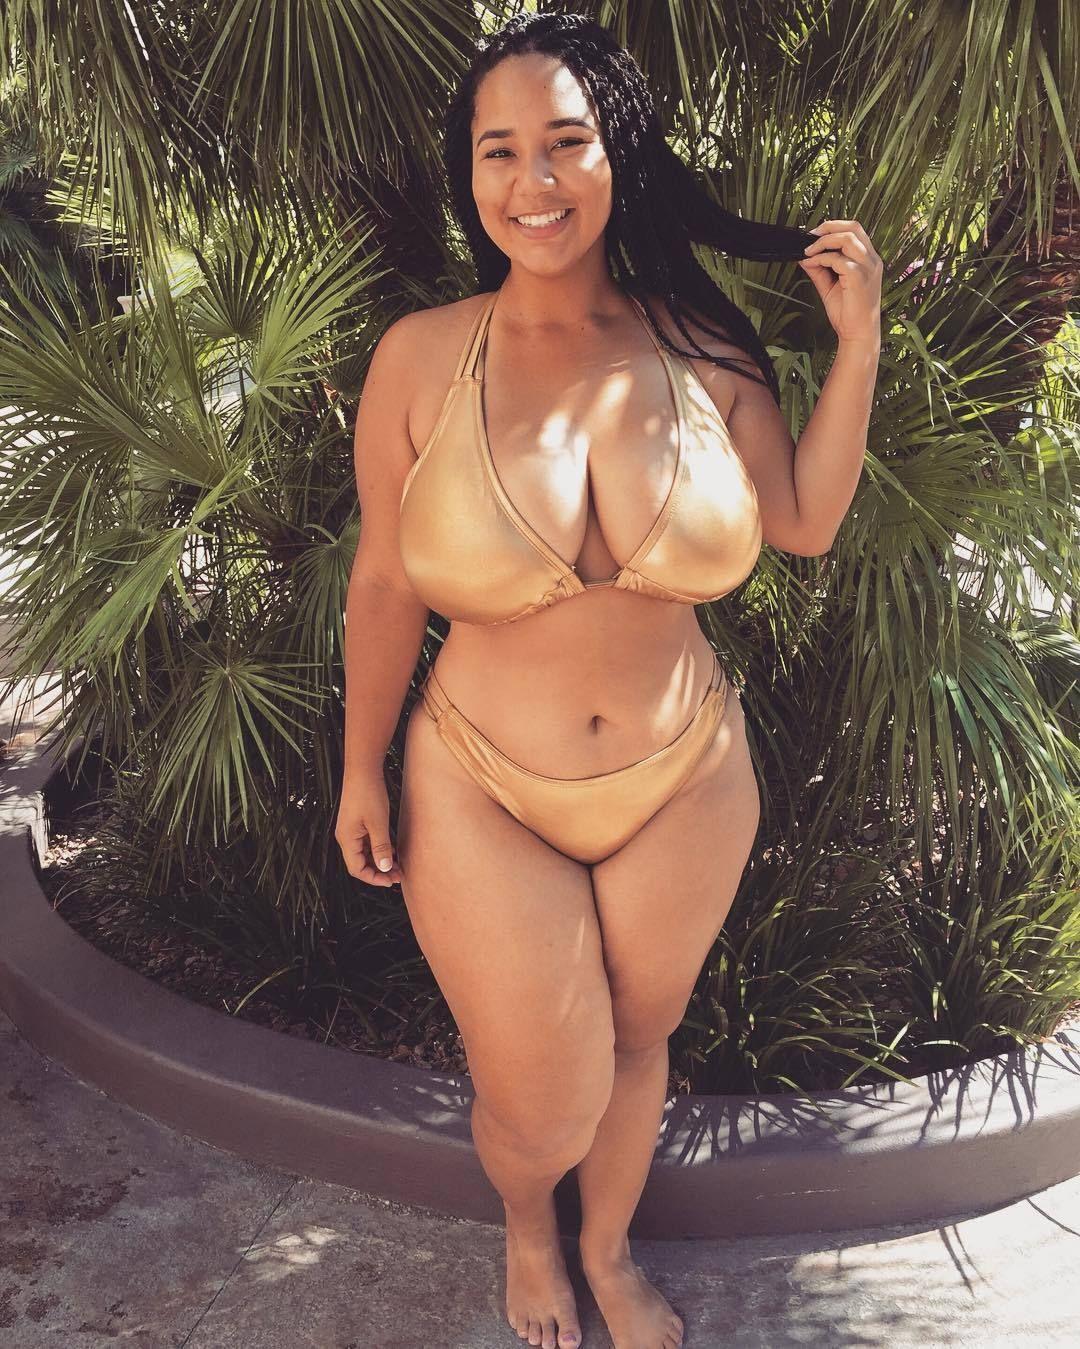 Busty naturally woman